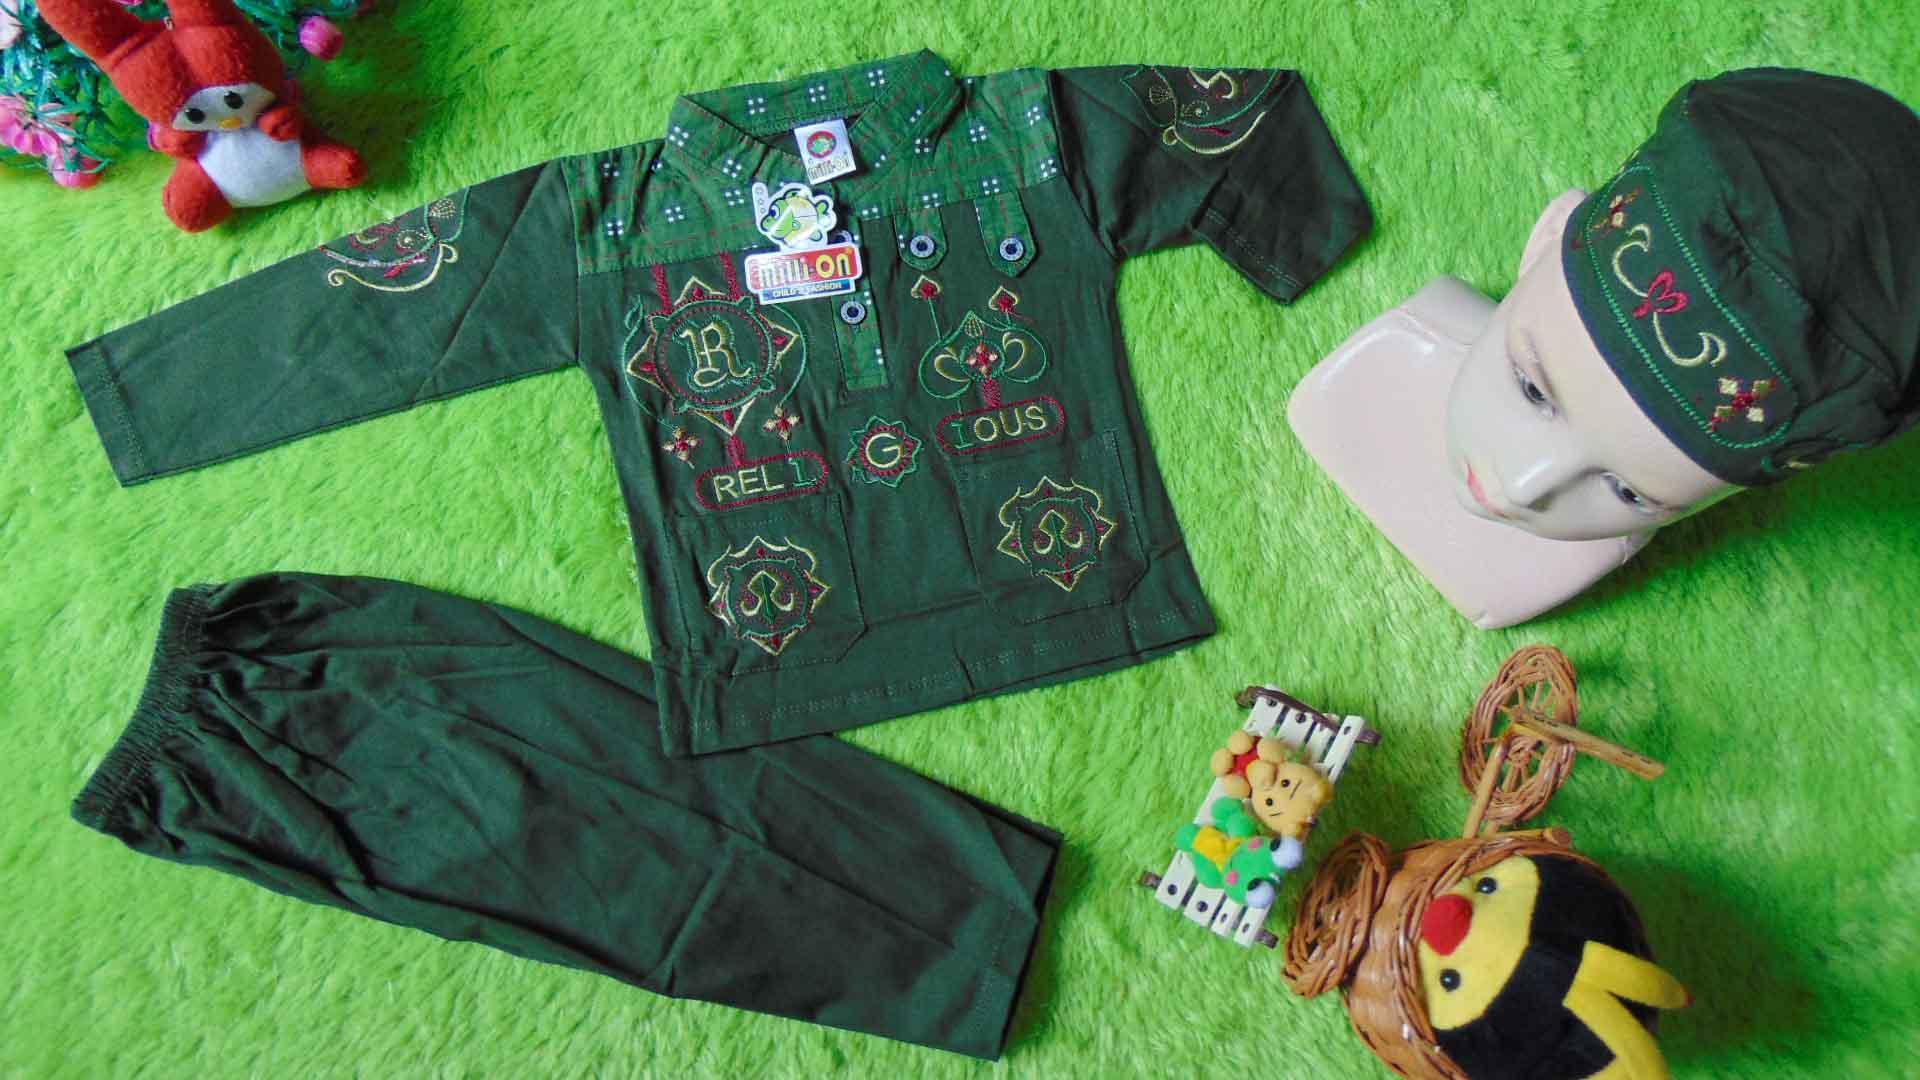 kembarshop - PLUS PECI setelan baju koko muslim anak bayi laki-laki newborn 0-